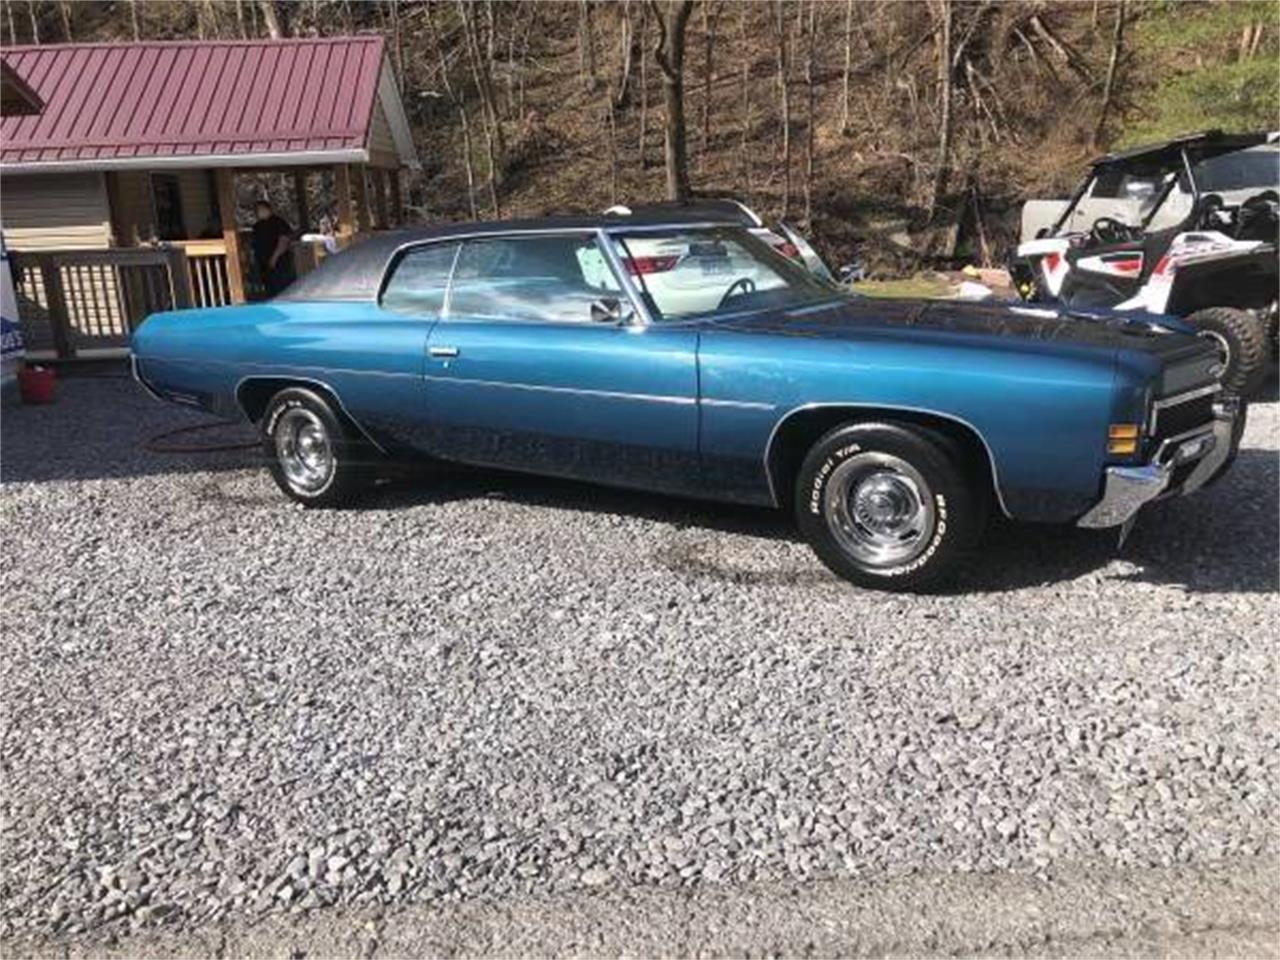 1972 Chevrolet Impala For Sale